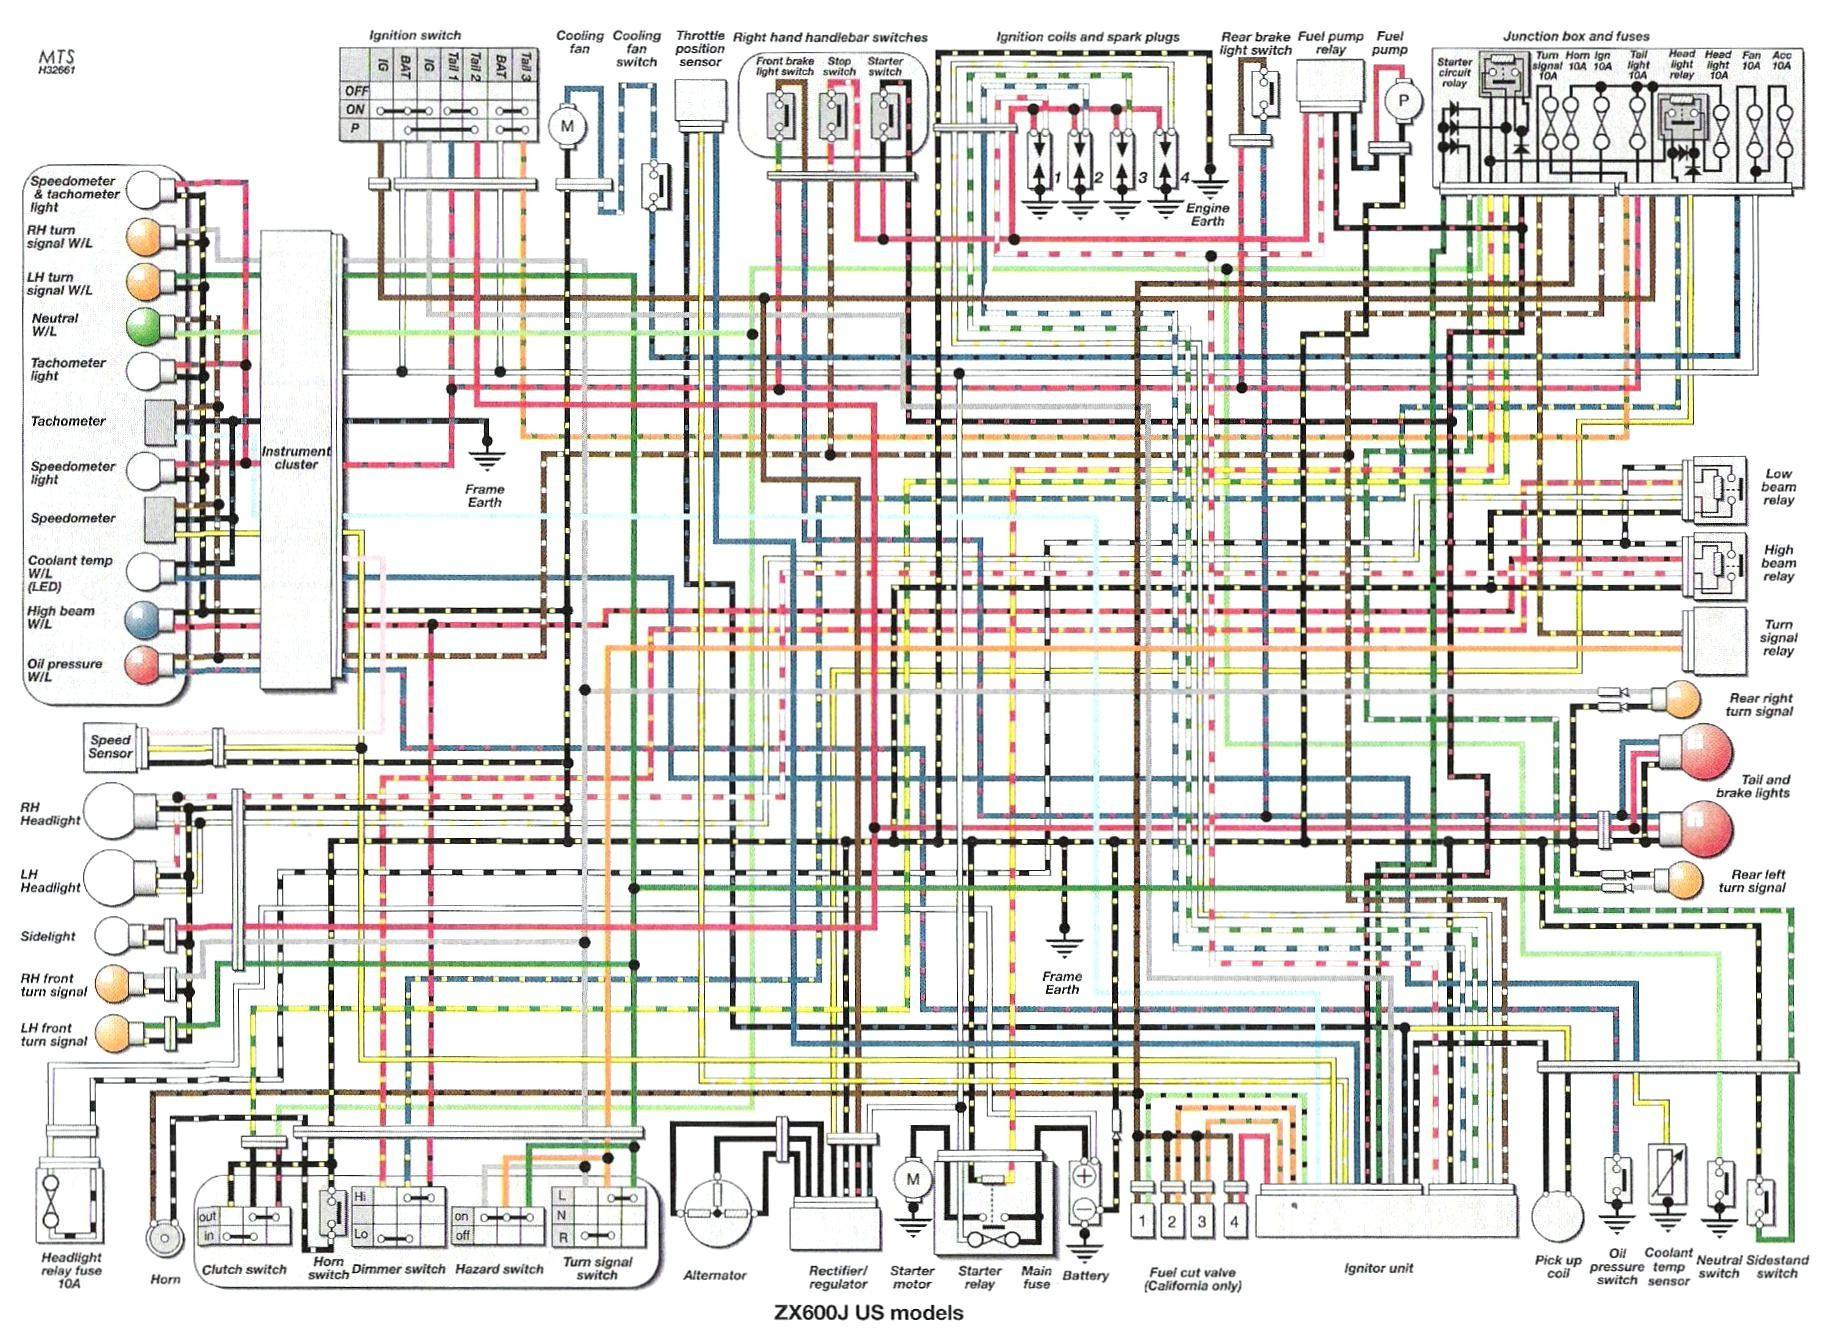 2005 yamaha r6 wiring diagram ignition yamaha r6 ignition wiring wiring diagrams  yamaha r6 ignition wiring wiring diagrams